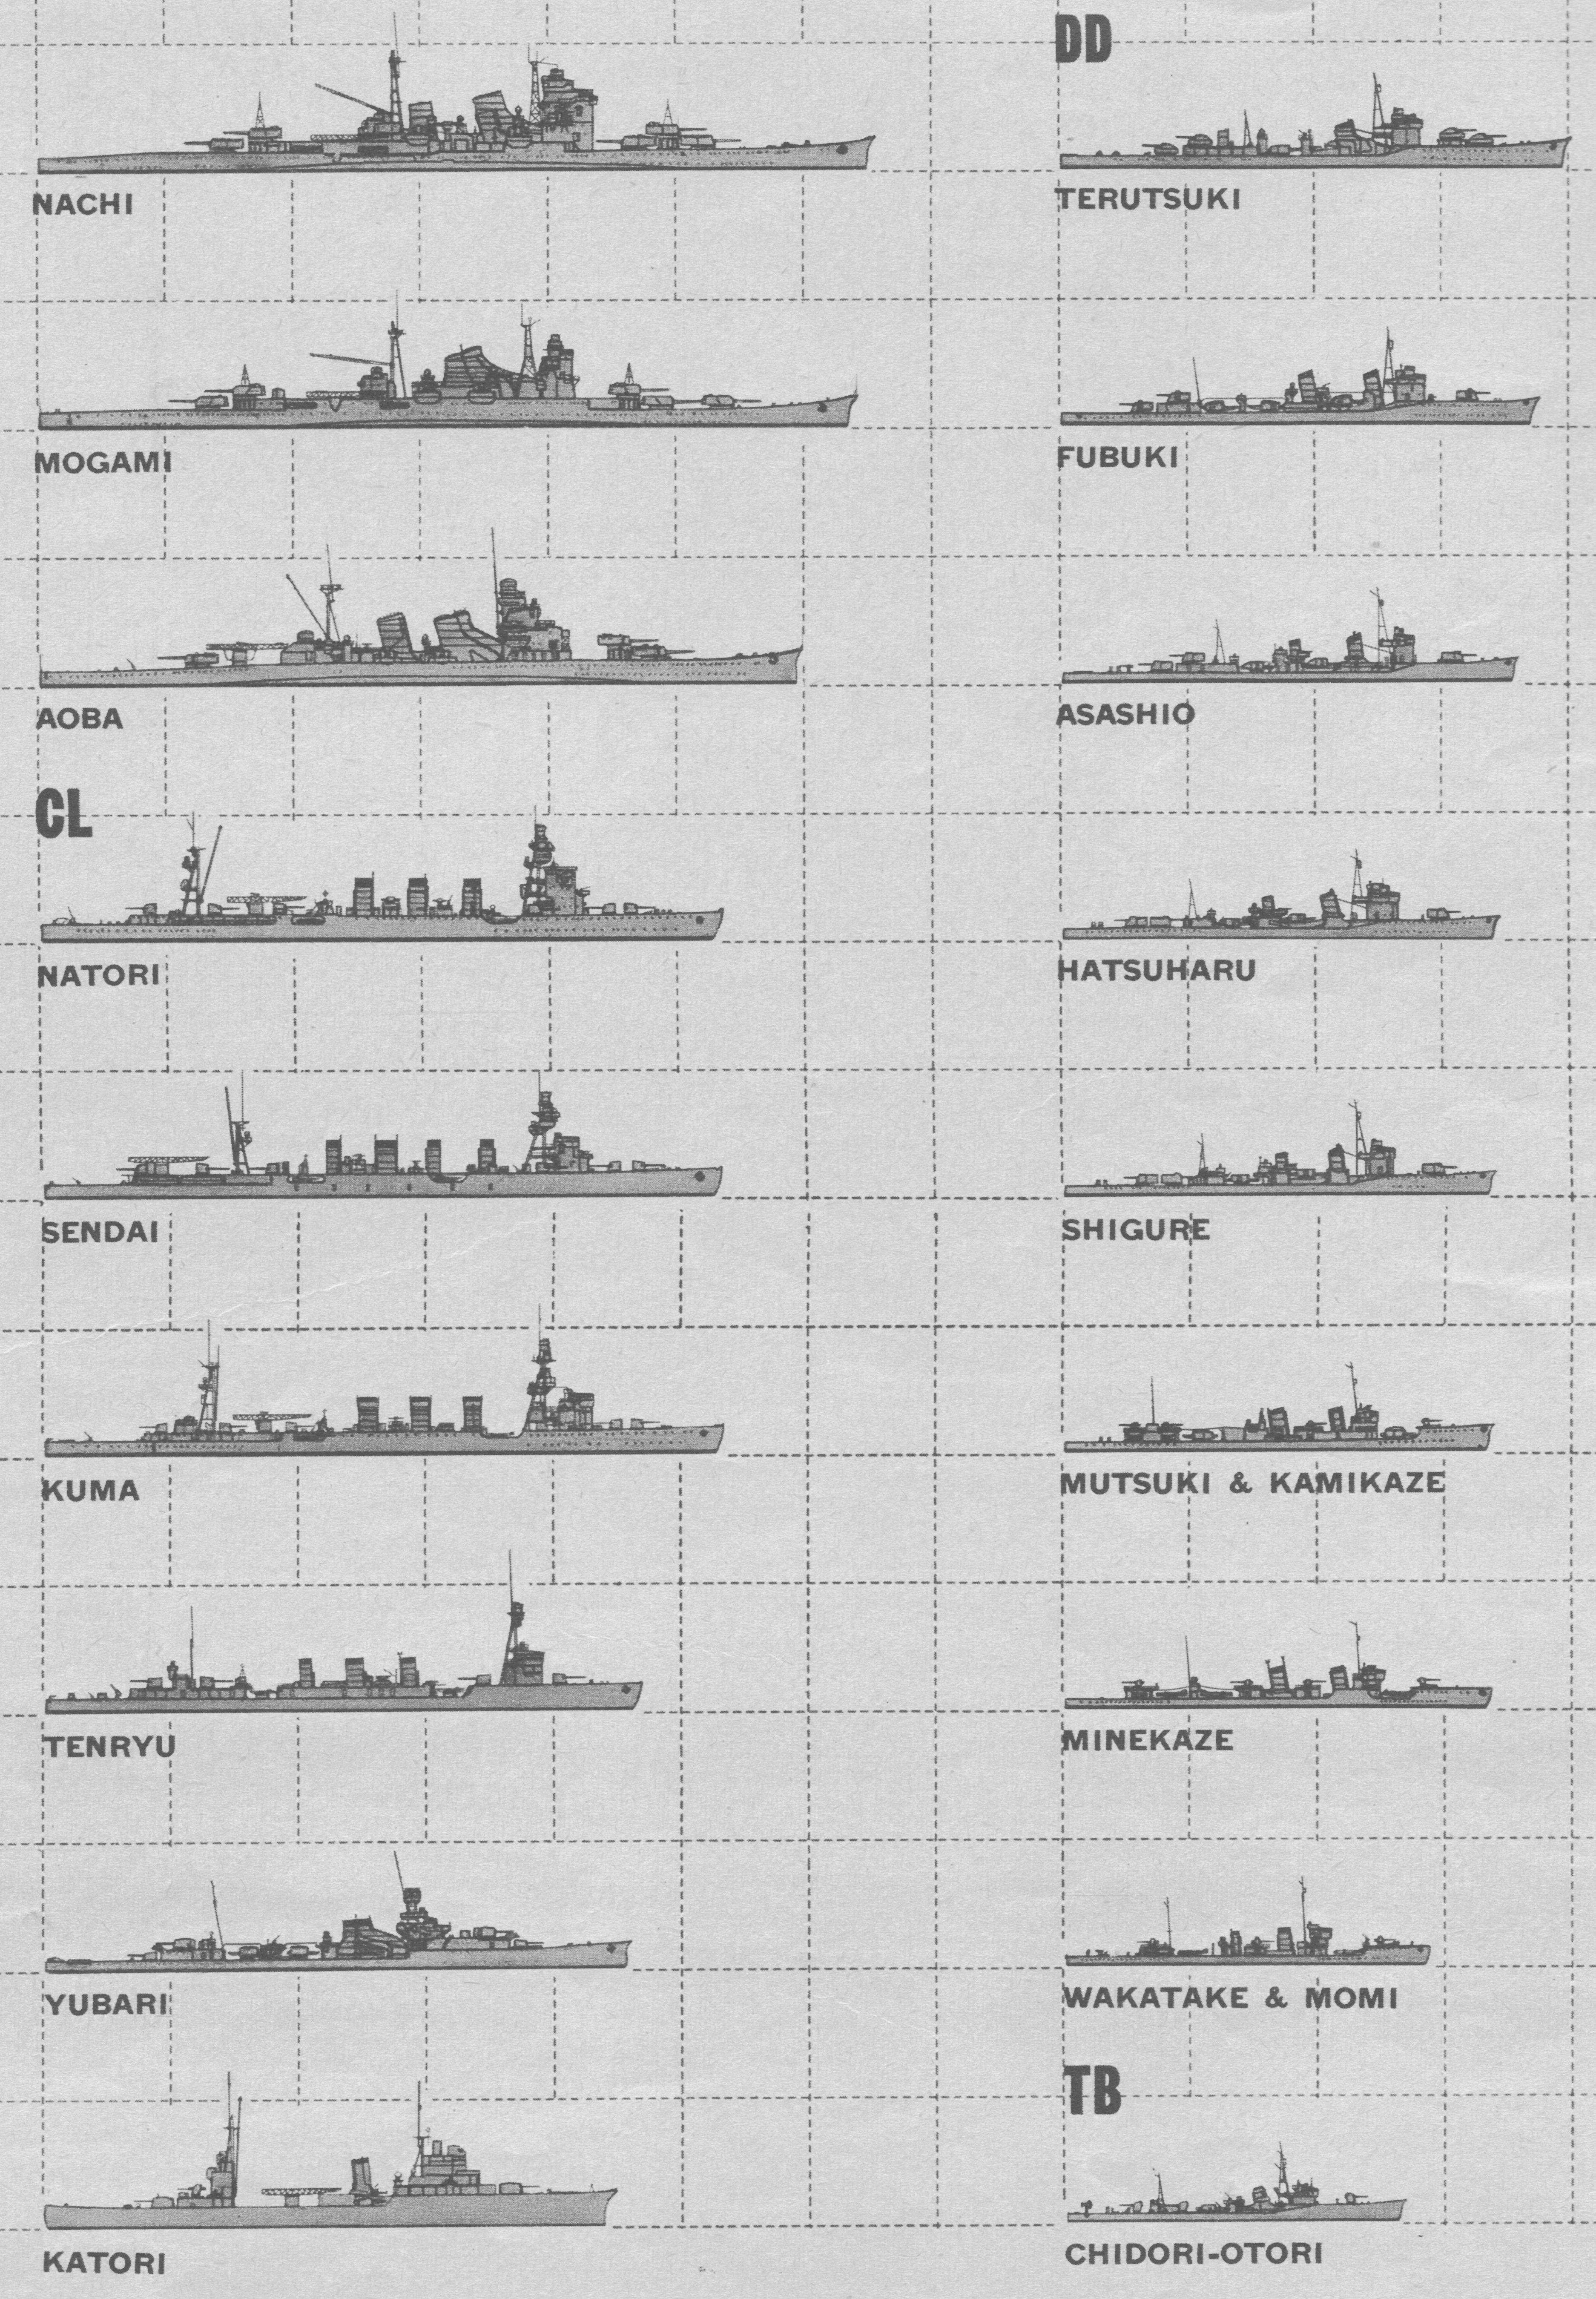 Size Comparison Iowa Yamato Battleship Bismarck Battleships - not ...